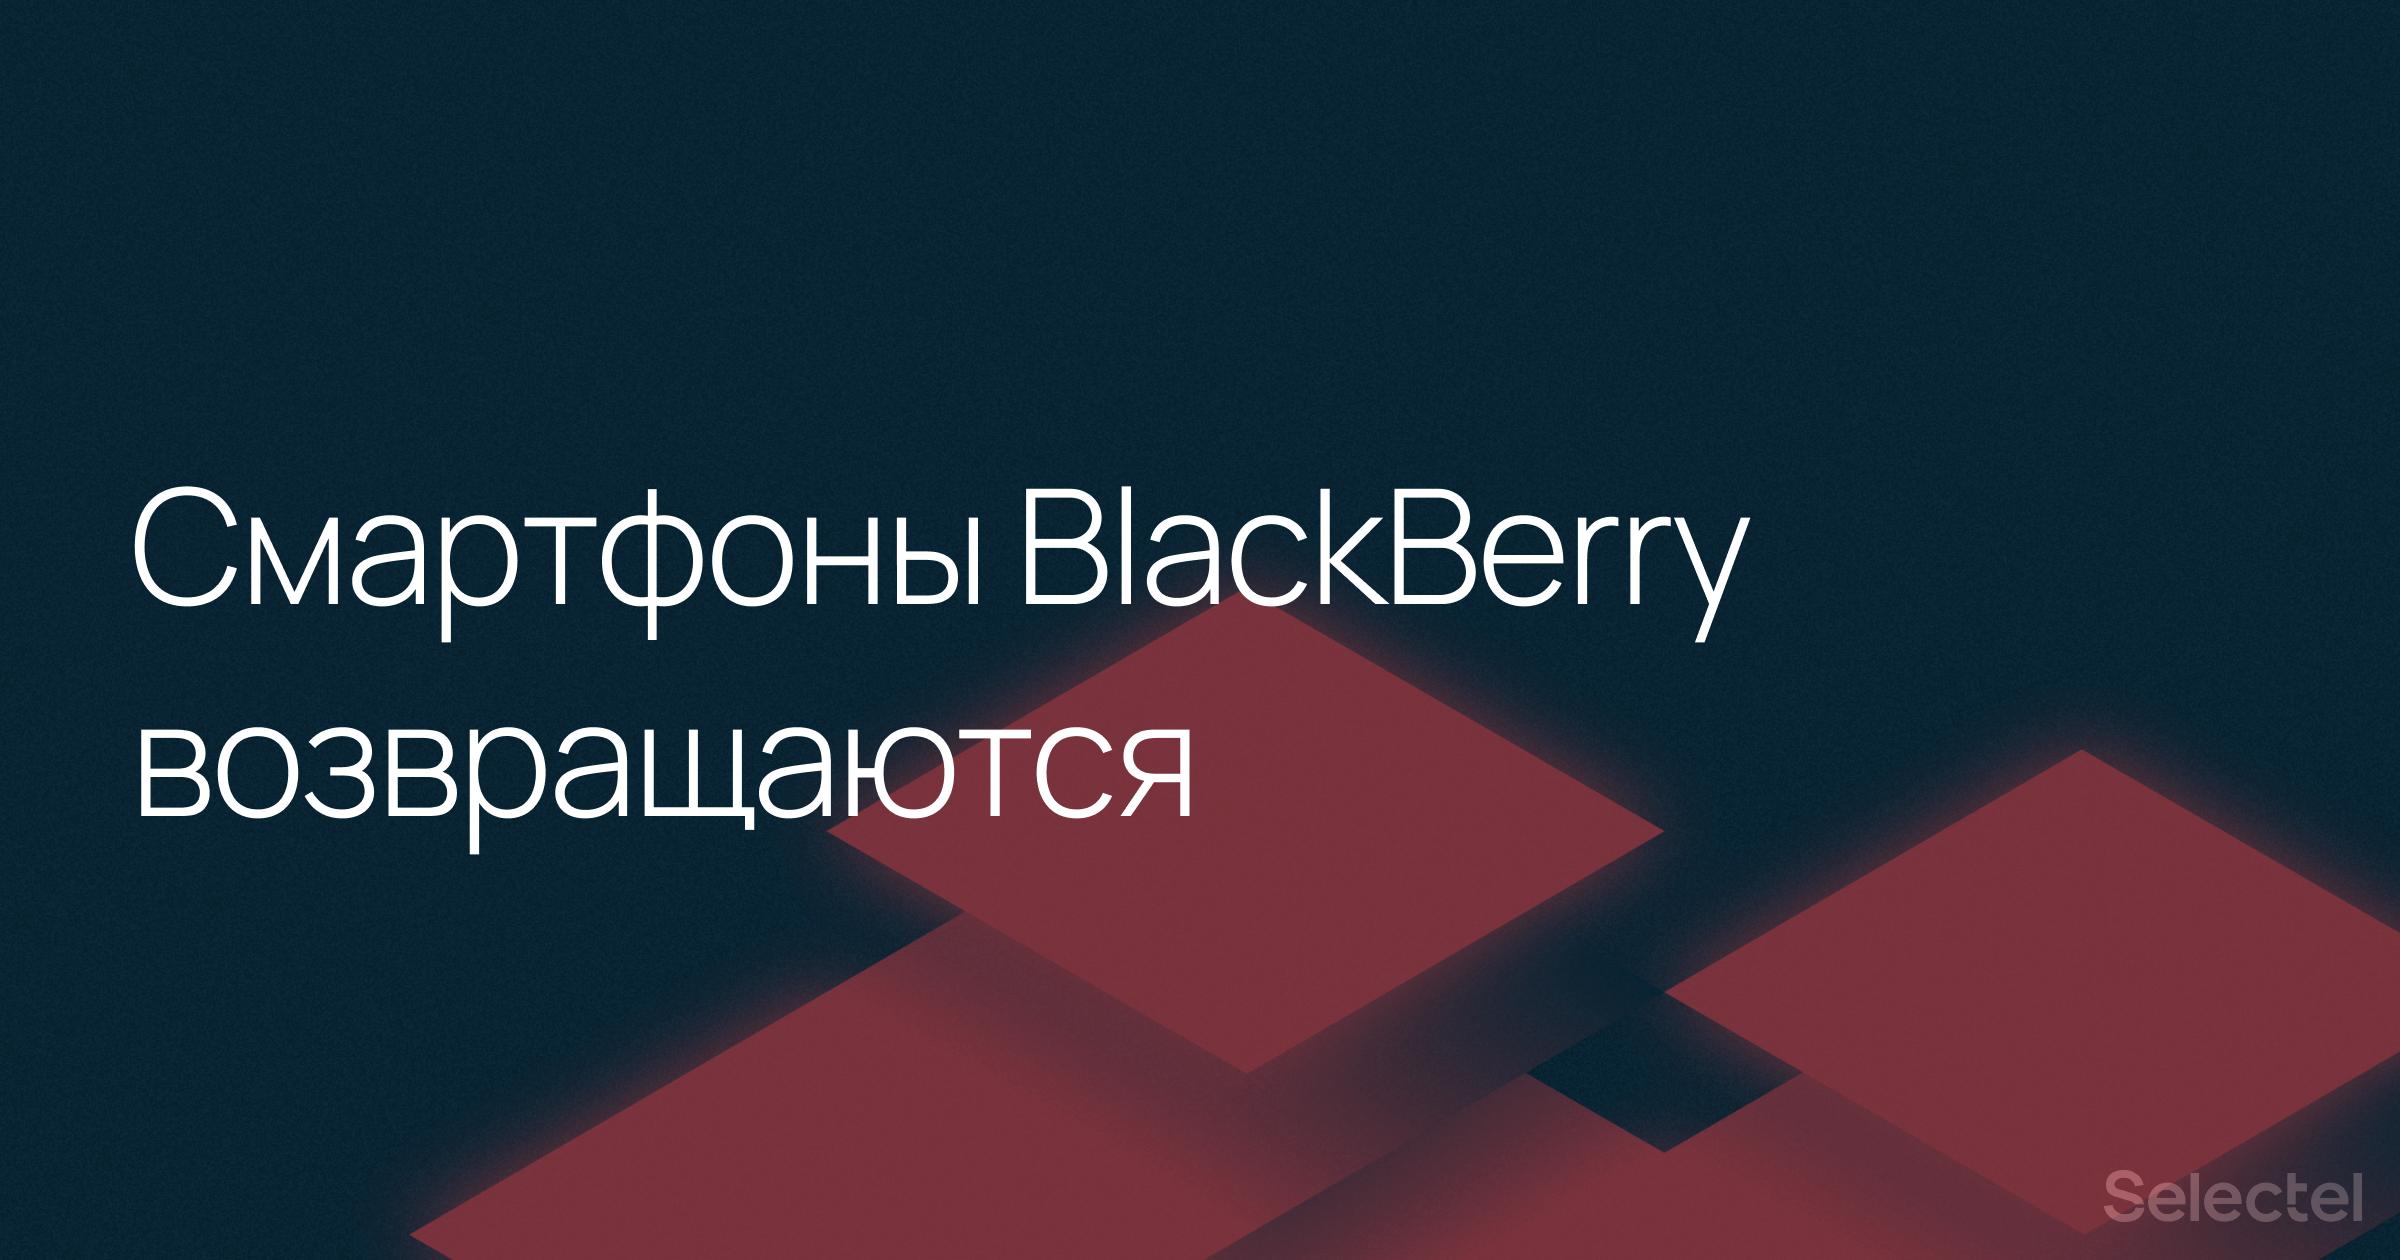 Смартфоны BlackBerry возвращаются с 5G-модулем на борту - 1